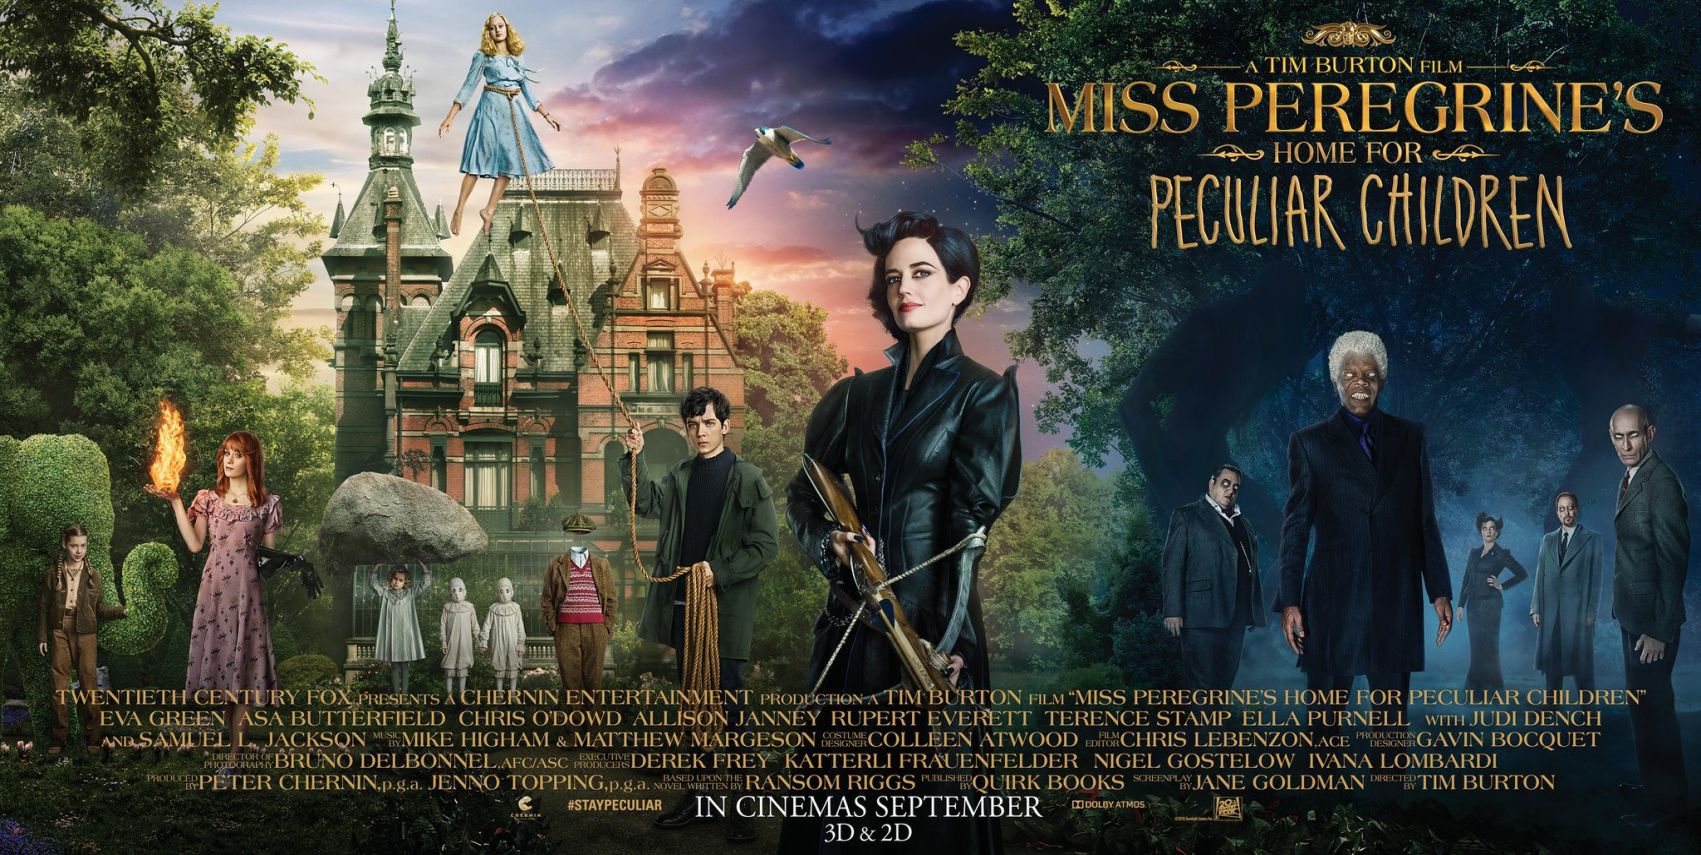 trailer + galéria: vándorsólyom kisasszony különleges gyermekei [miss peregrine's home for peculiar children] (2016)